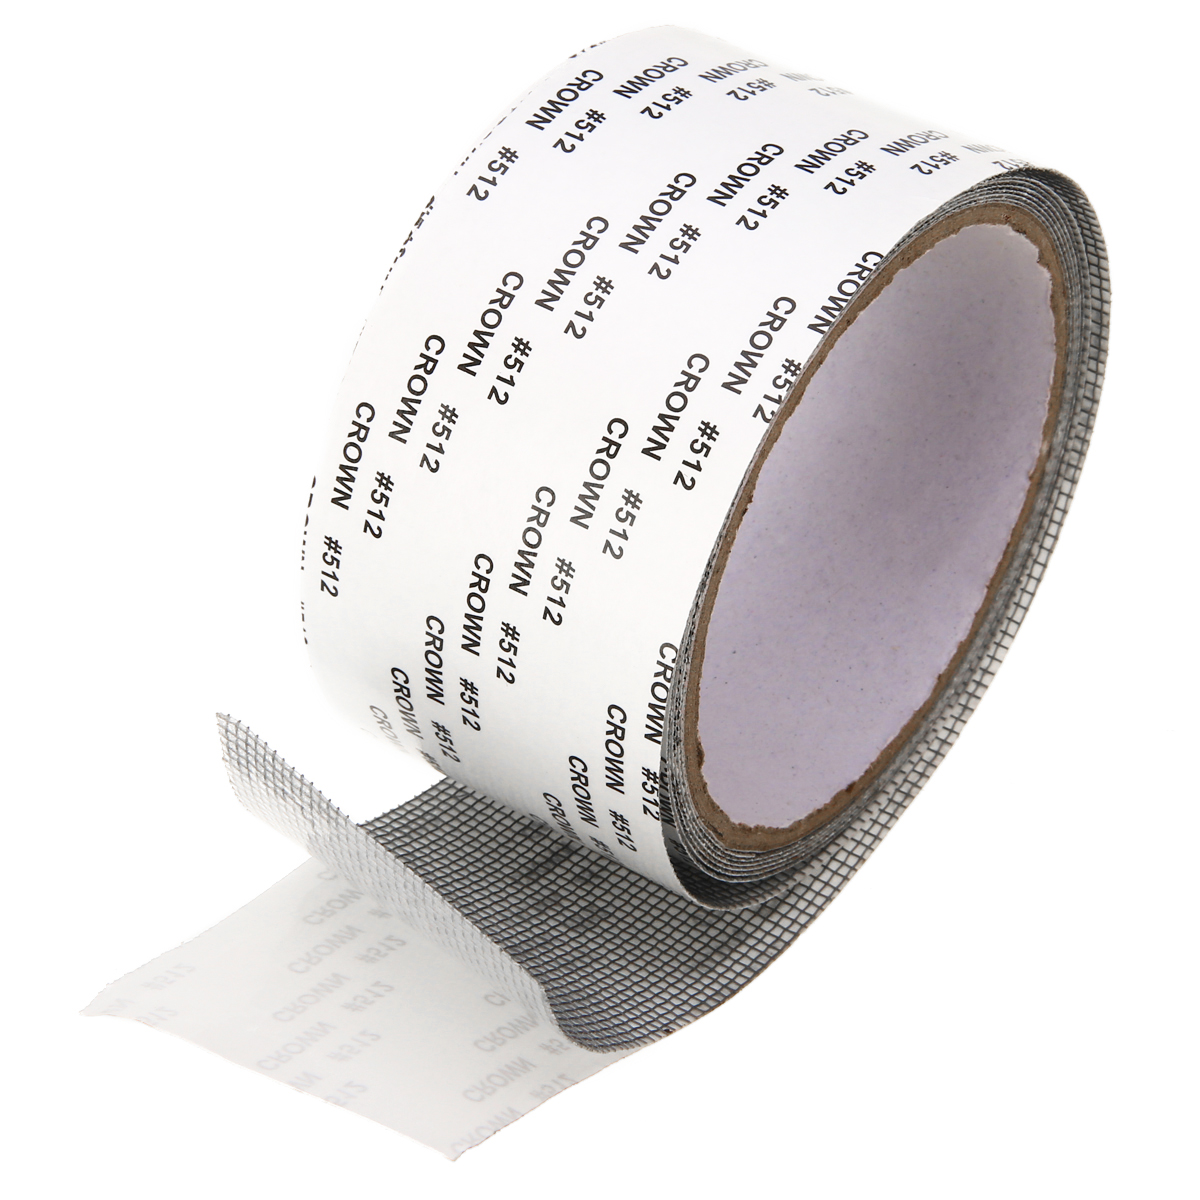 Fiberglass Repair Kit | Anti Mosquito Mesh Sticky Wires Patch Repair Kit Window Screen Repair Tape Fiberglass Covering Mesh 5*200cm